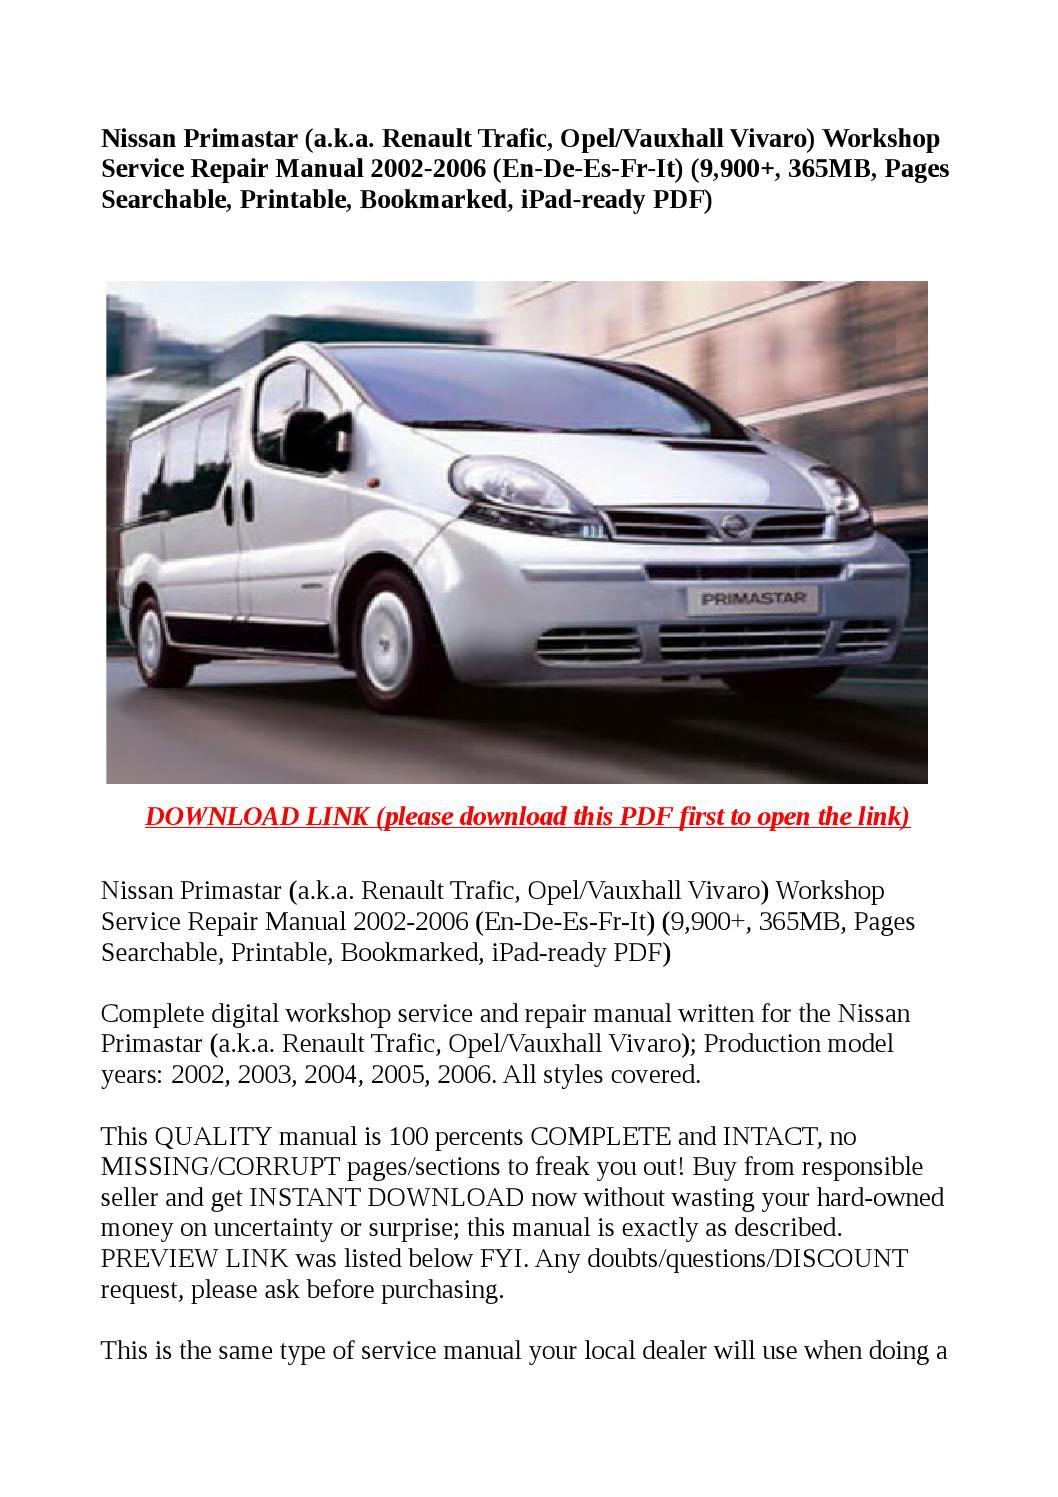 Nissan primastar (a k a renault trafic, opel vauxhall vivaro) workshop se  by buhbu - issuu